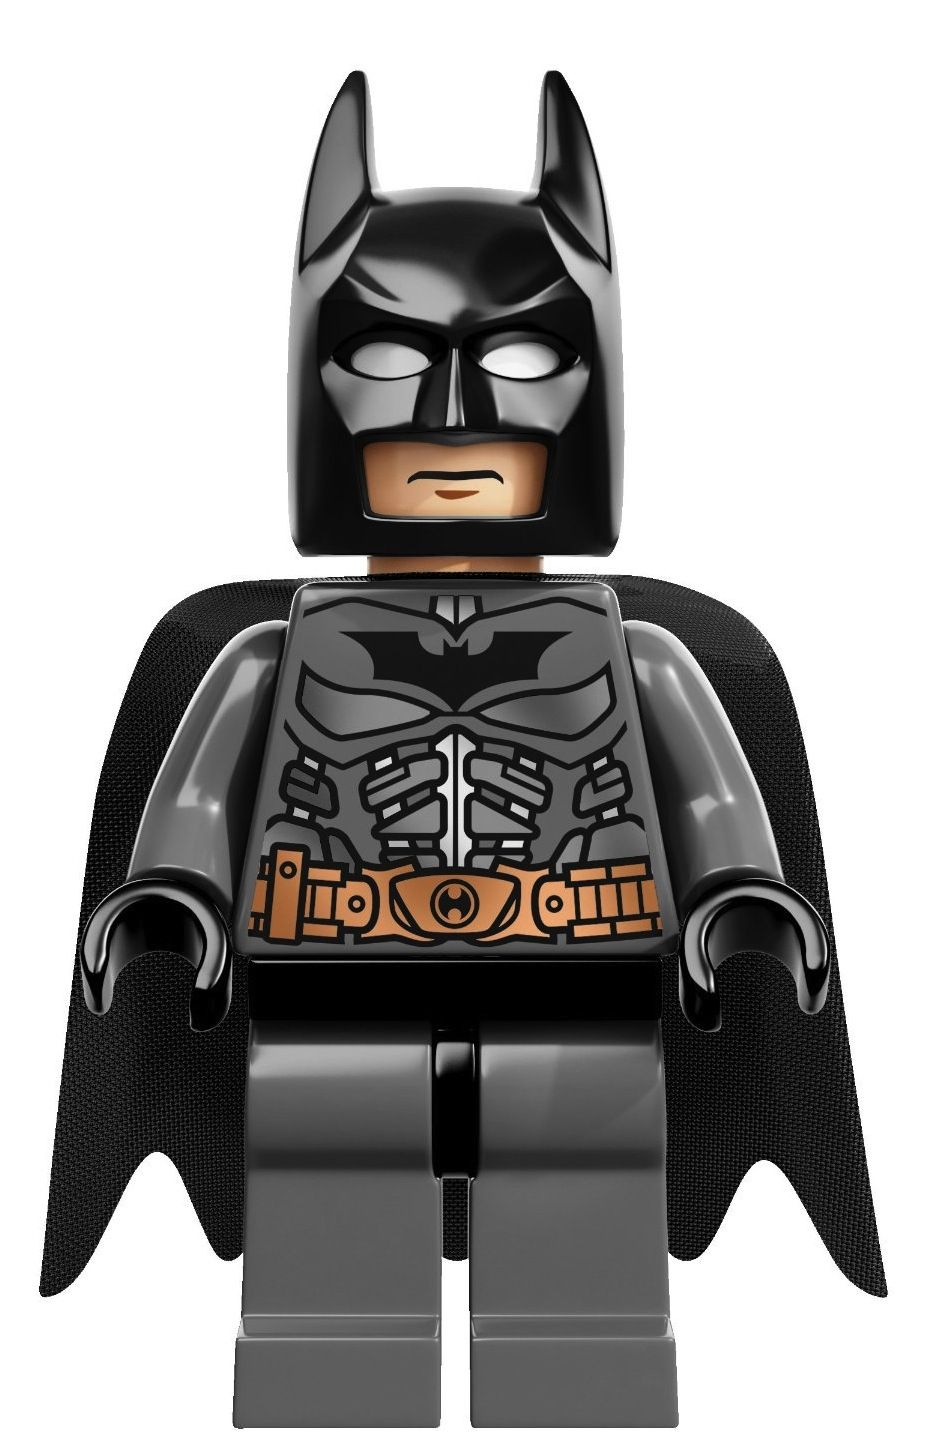 Lego super heroes.